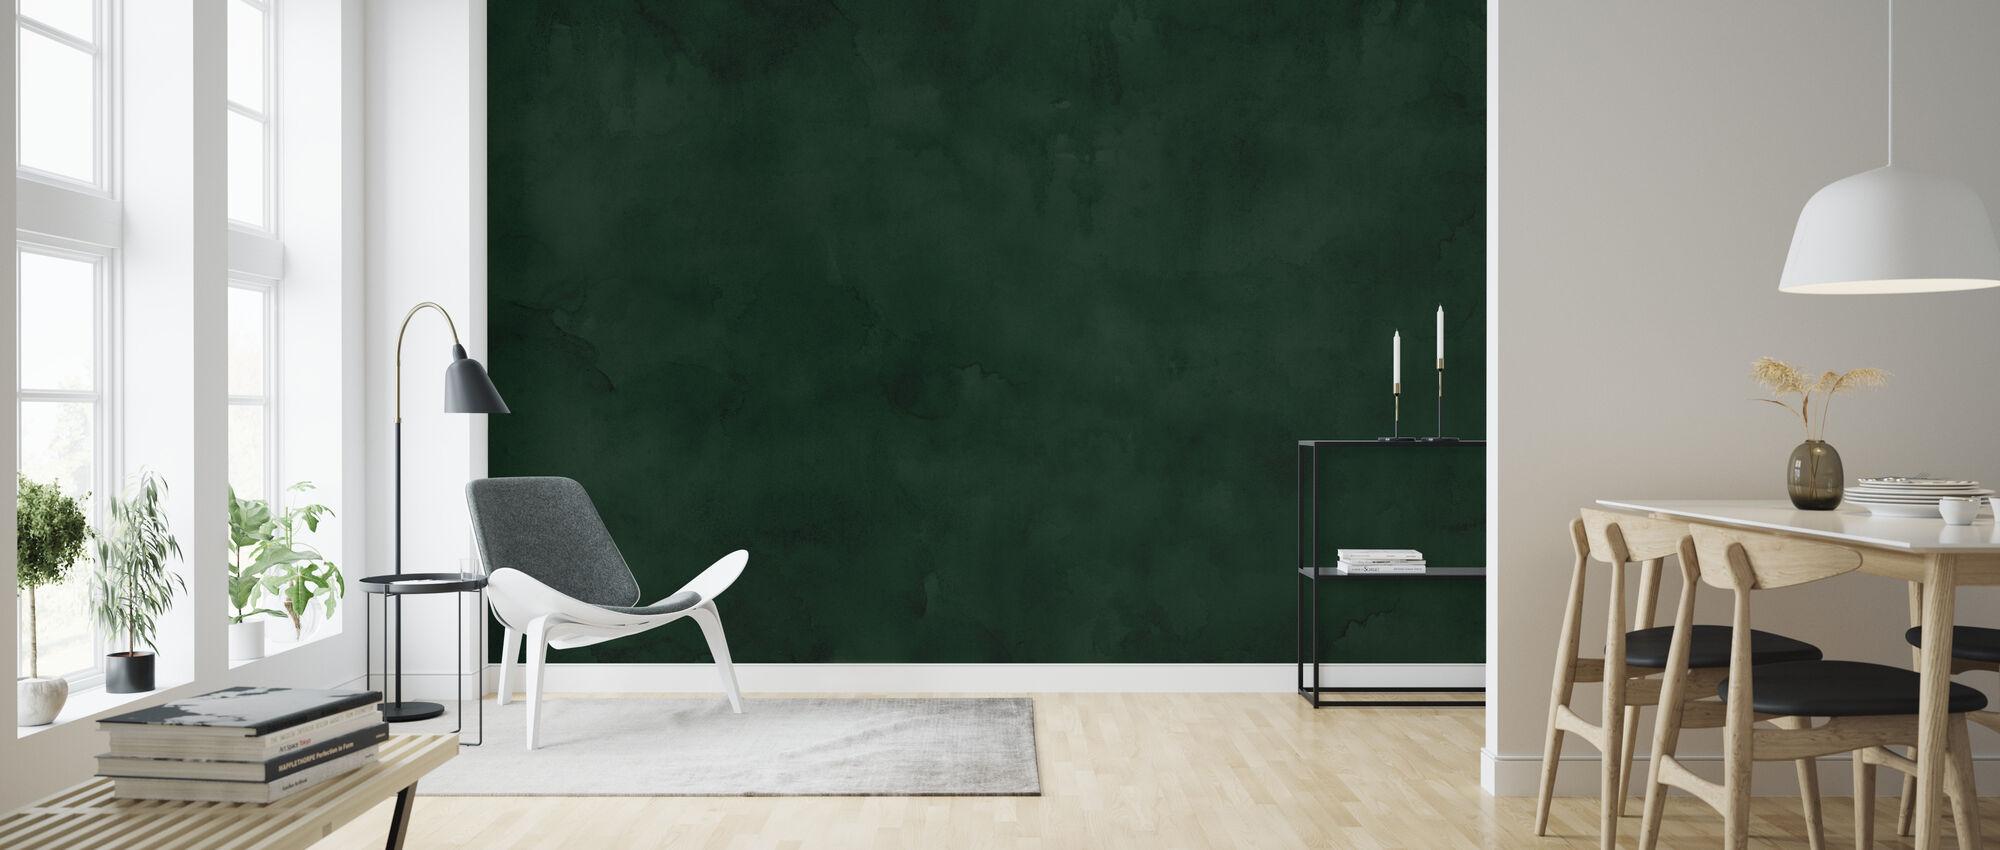 Akvarel - Mørk Emerald - Tapet - Stue